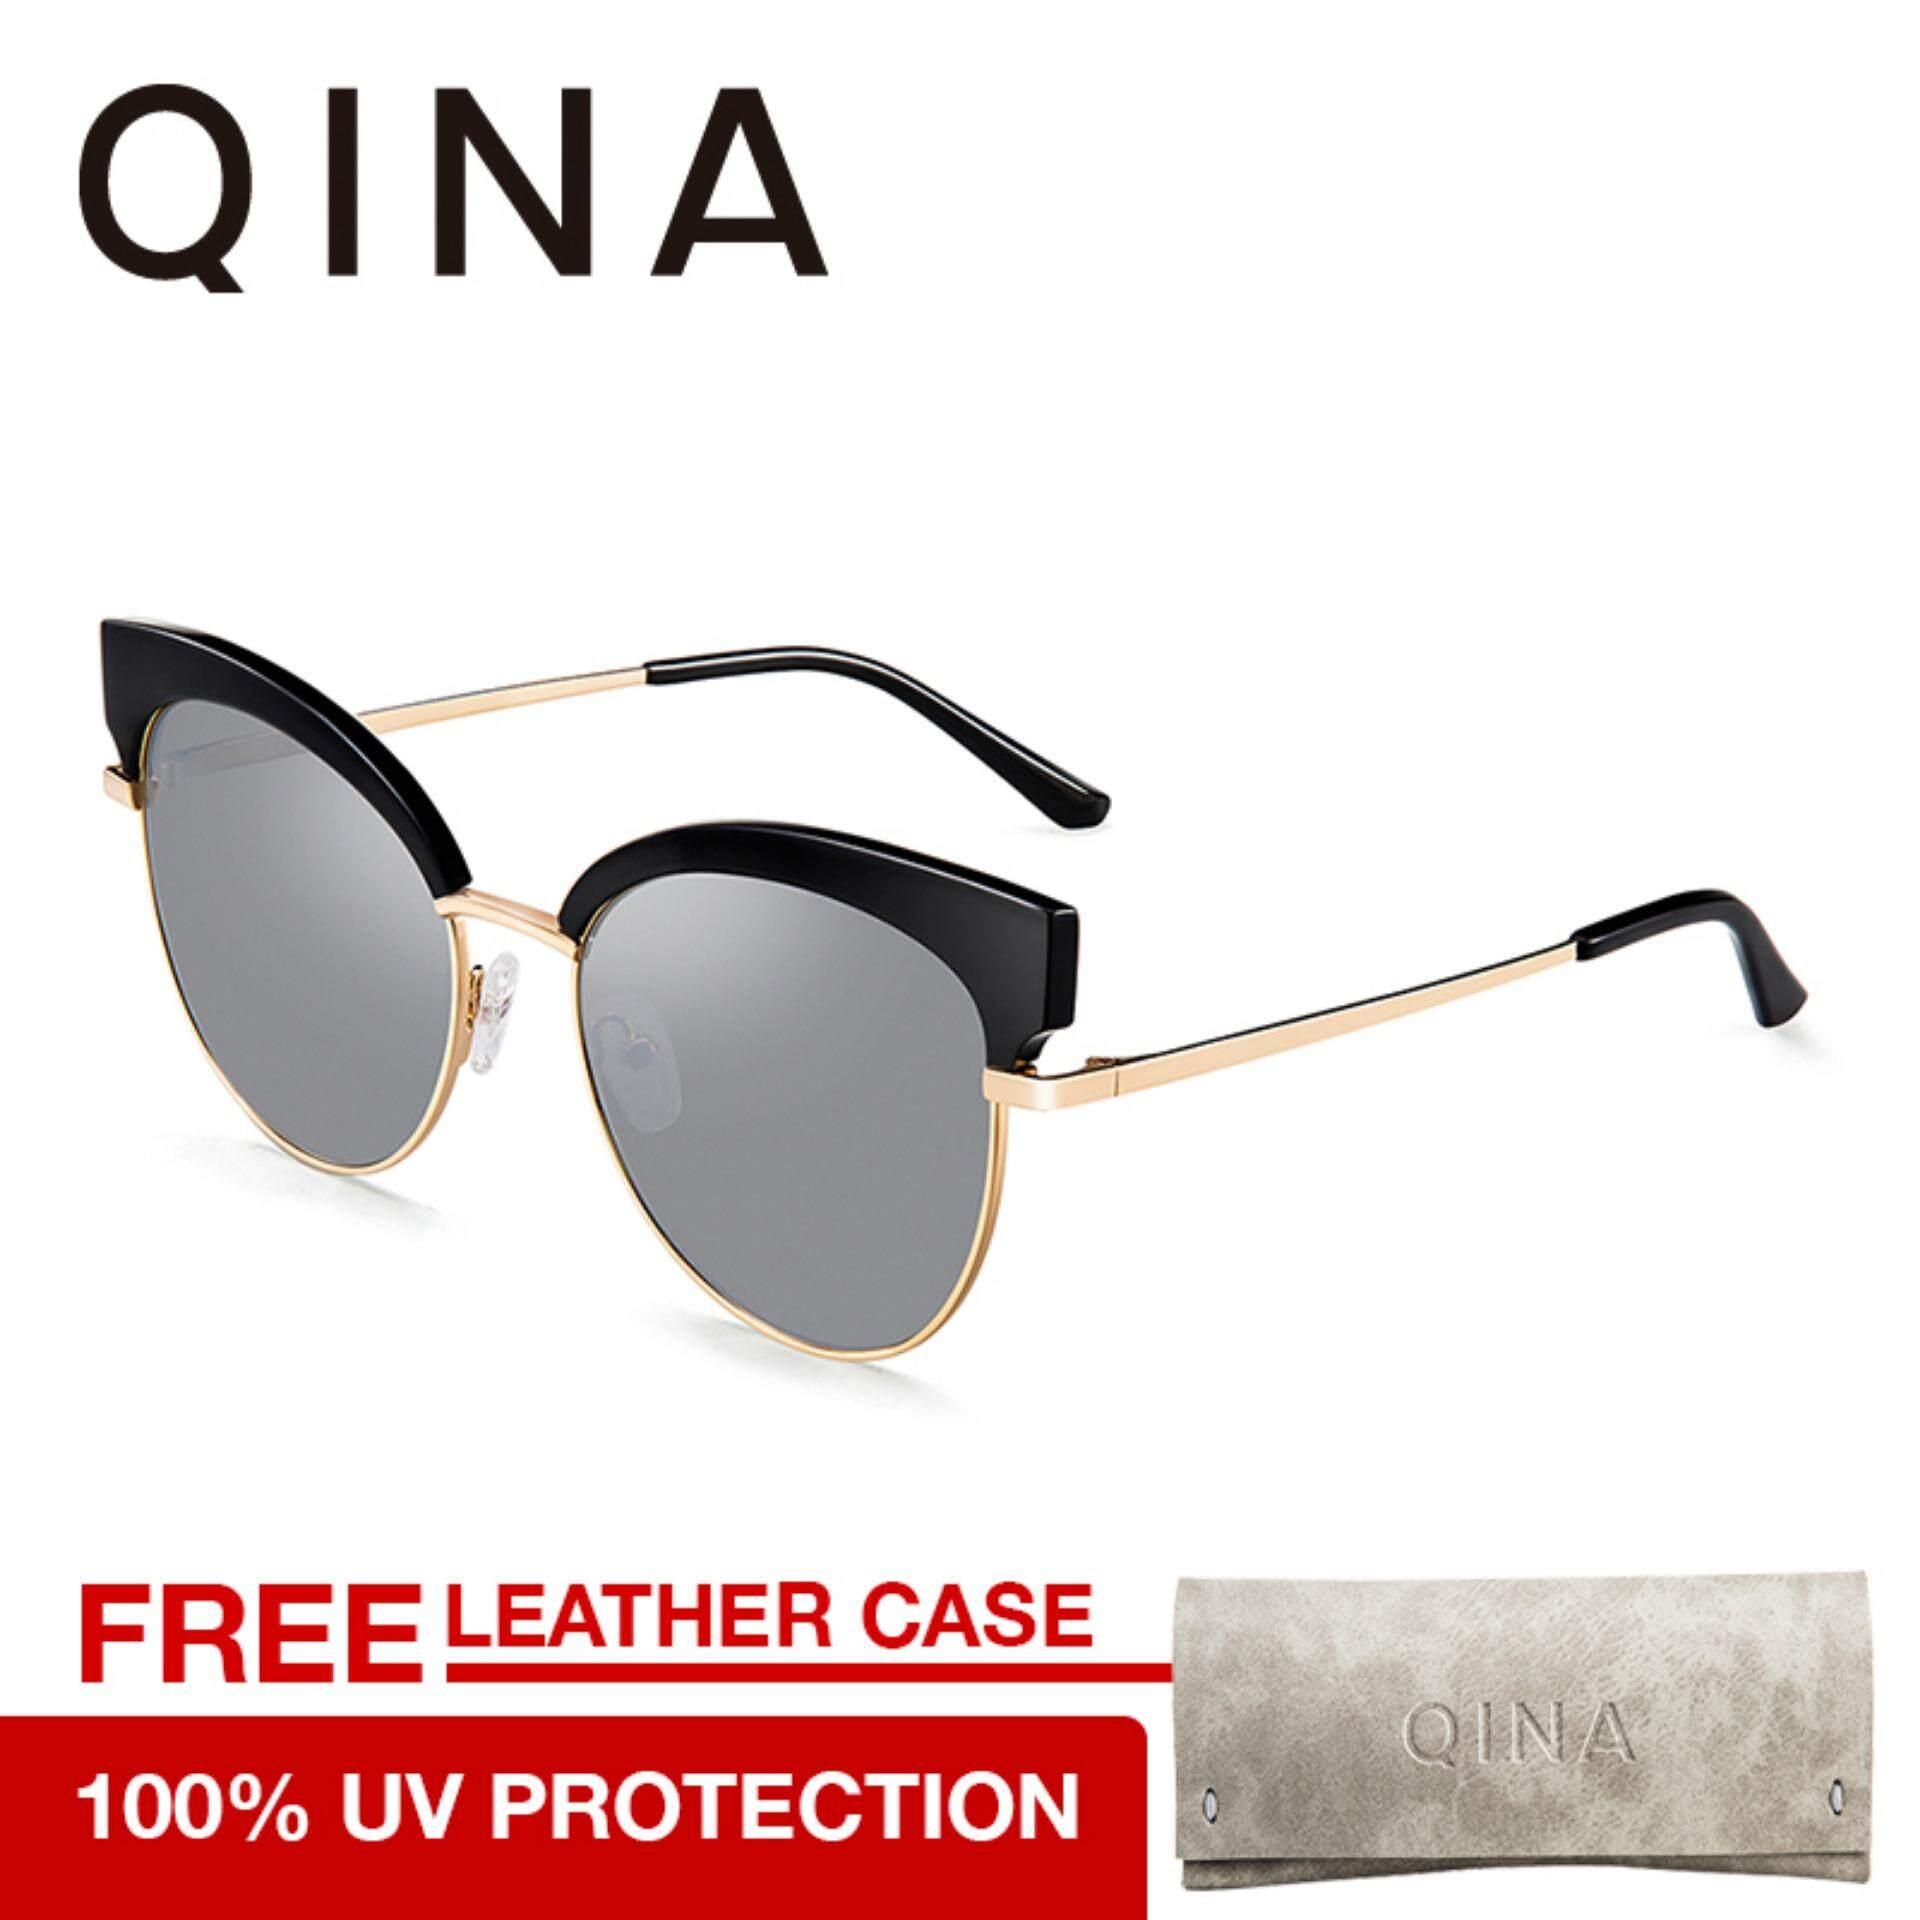 Qina แว่นกันแดดสำหรับผู้หญิง กรอบทรงตาแมว ป้องกันรังสี Uv400 Qn6011 คอลเลคชั่นปี 2018 เป็นต้นฉบับ